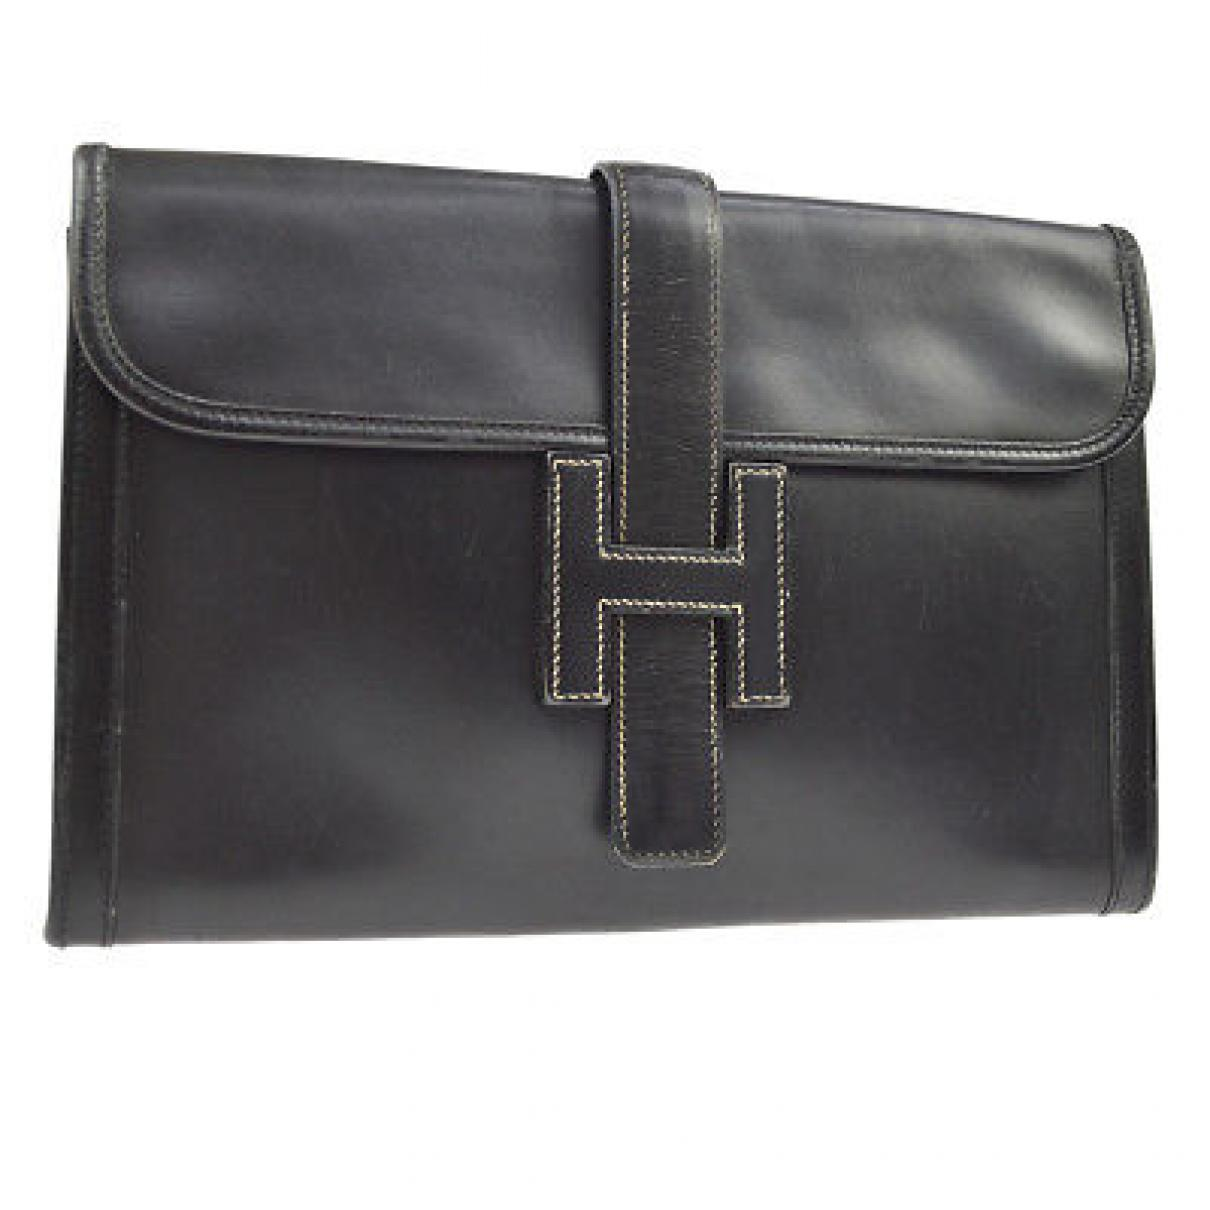 2b821b9c536 Hermès Vintage Jige Black Leather Clutch Bag in Black - Lyst